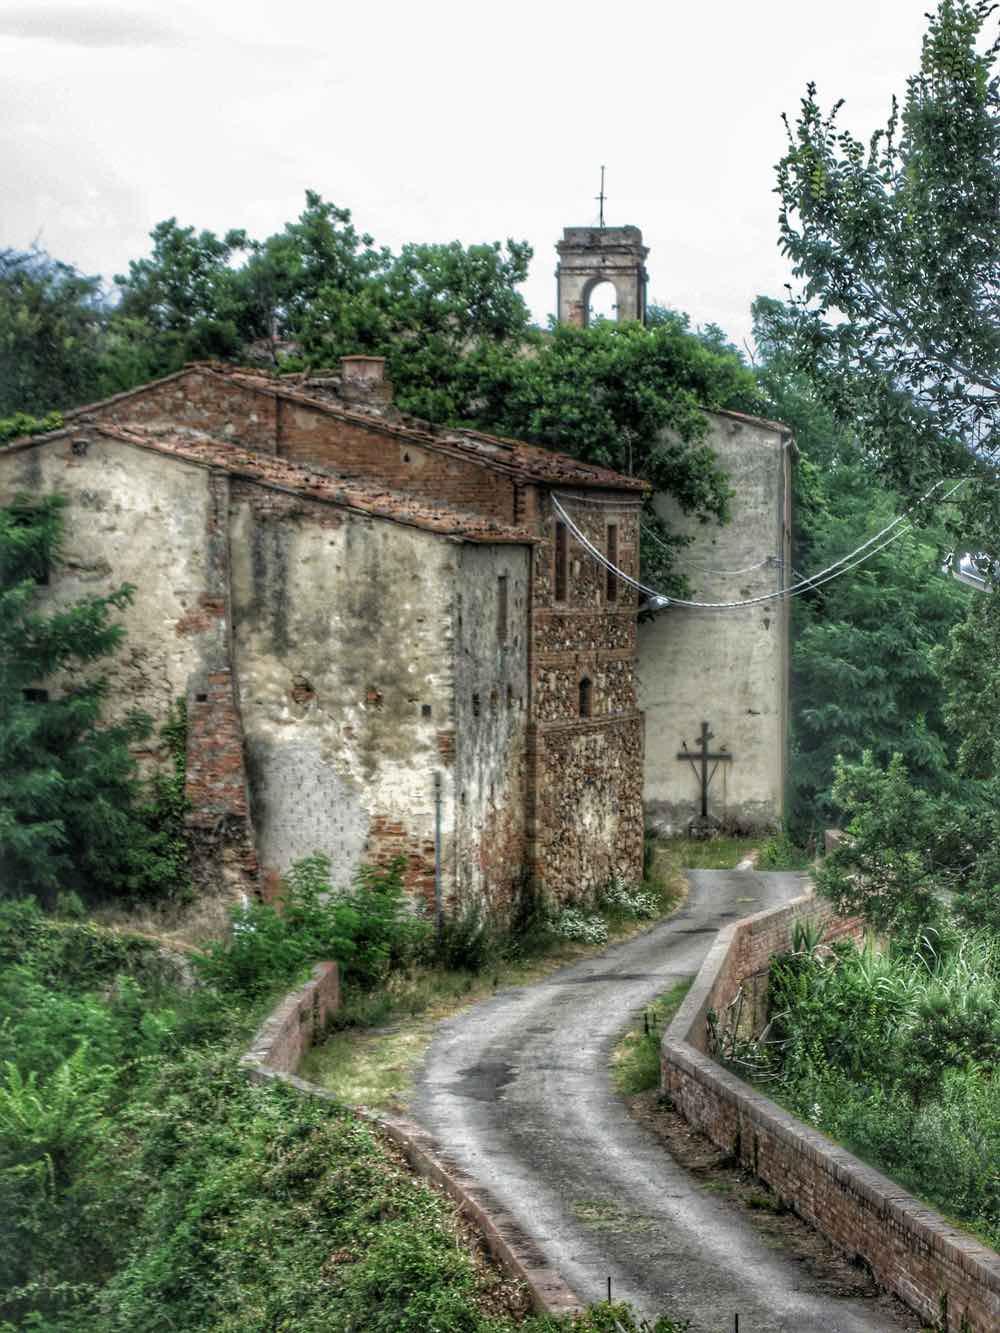 Strada tra case abbandonate a Brento Sanico in Toscana